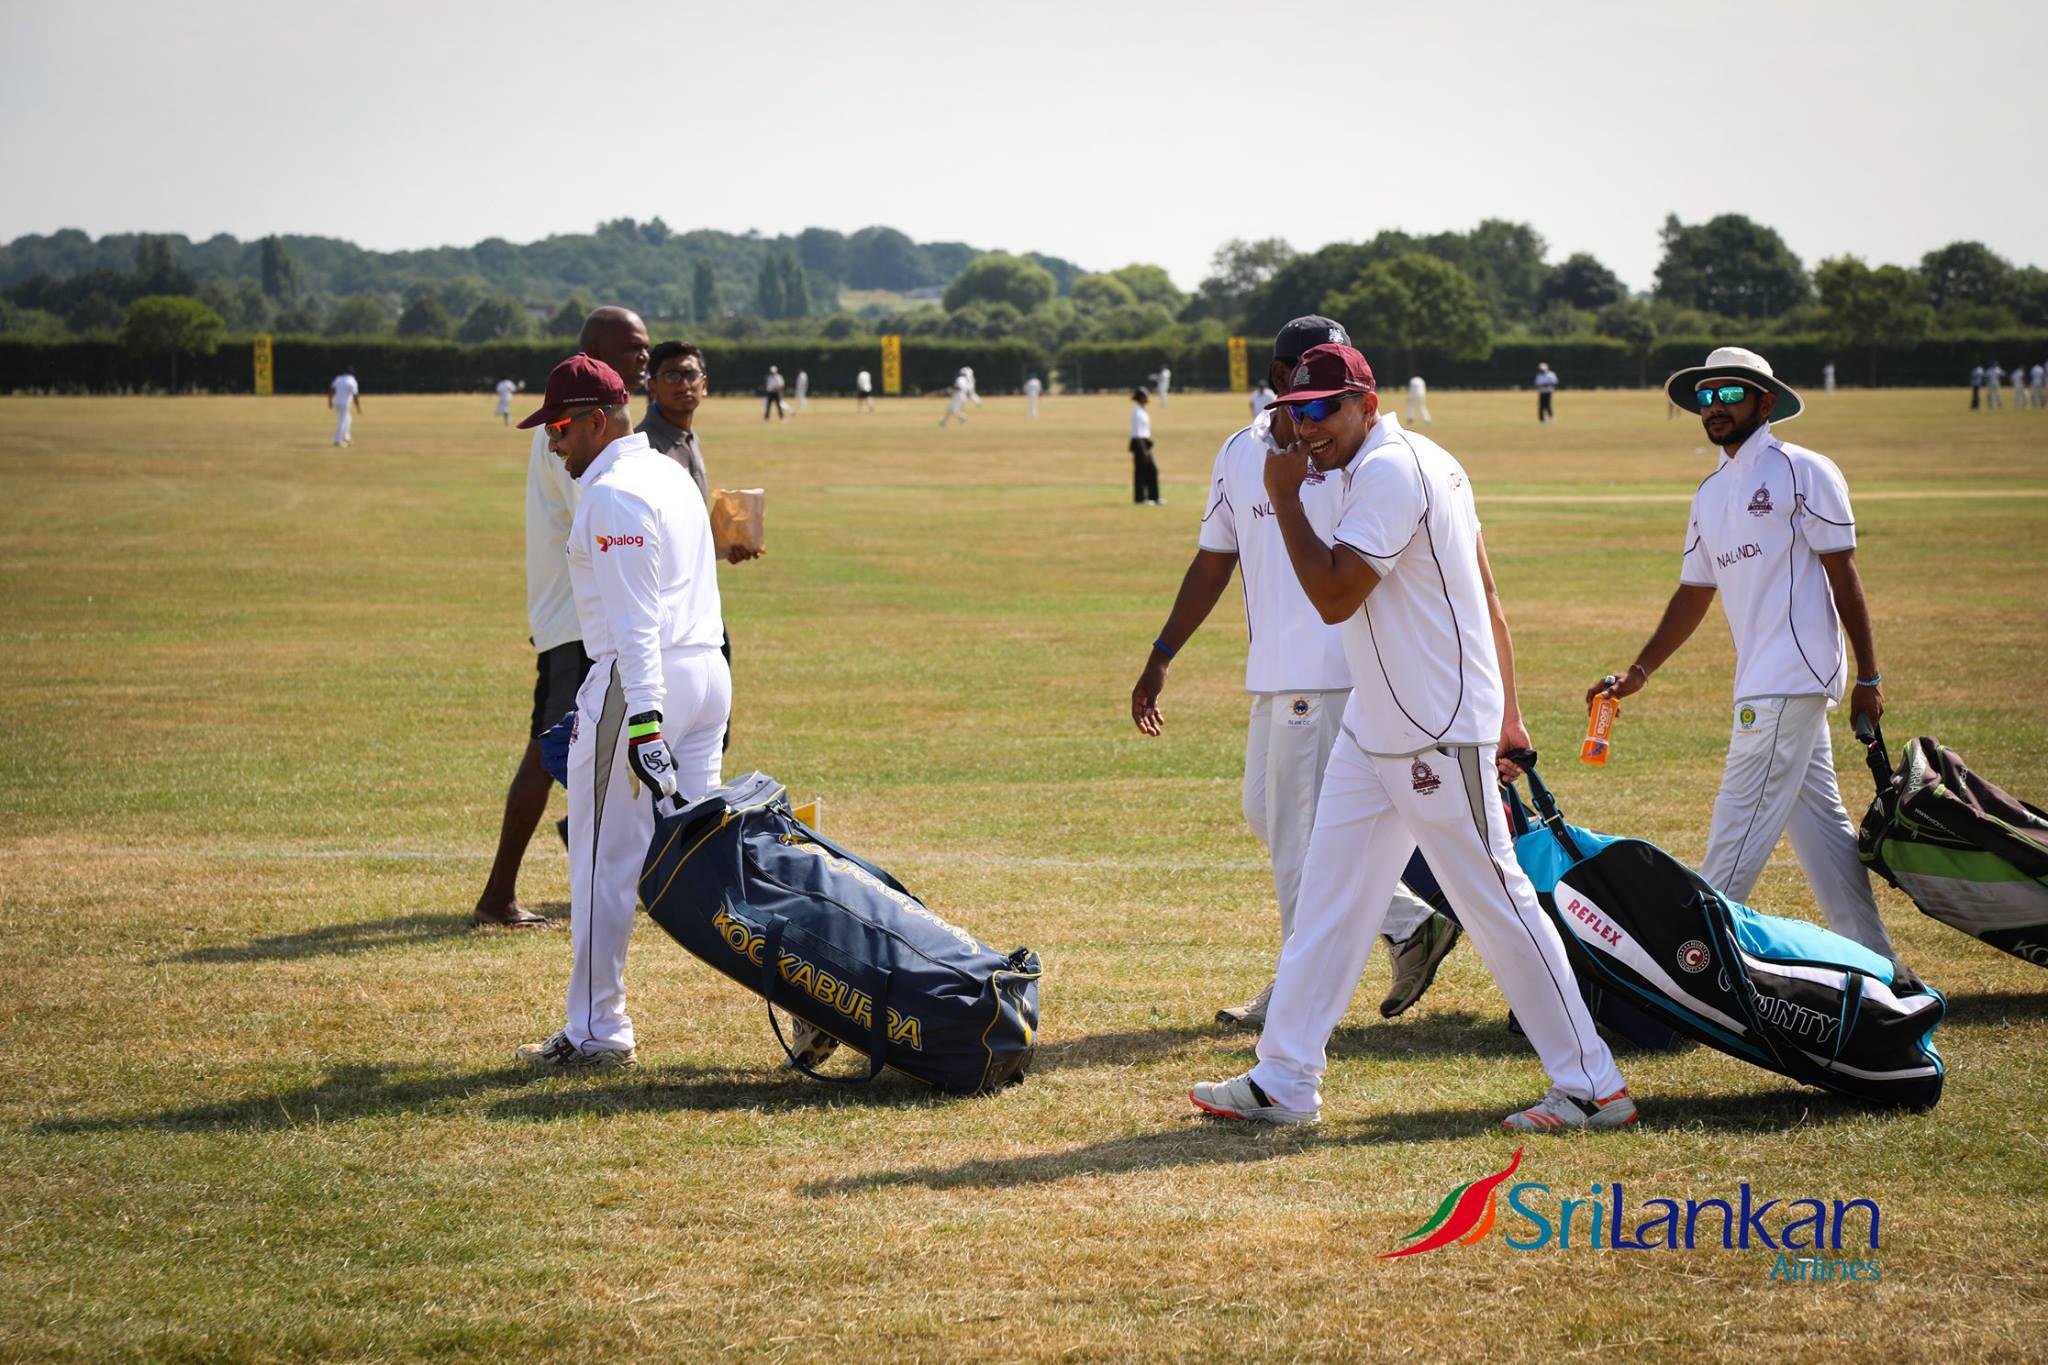 Sri-Lankan-airlines-cricket-festival-london-2017-natalia-smith--photography-27.jpg